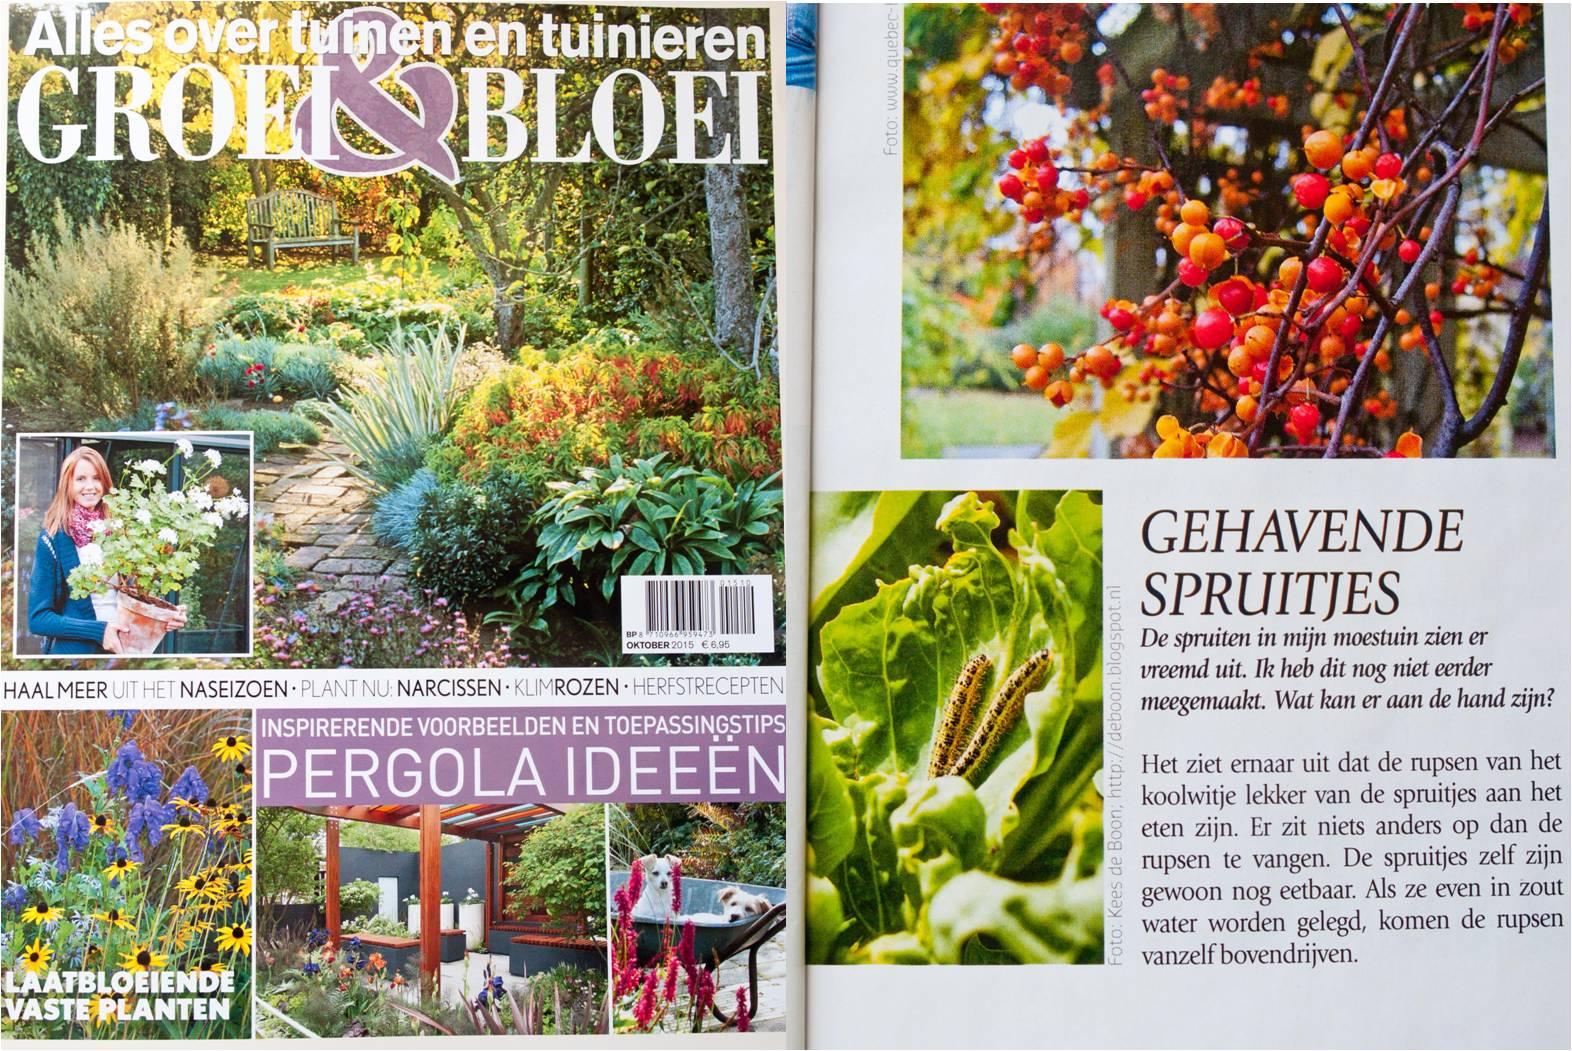 spruiten spruitkool spruitjes rupsen groei bloei media magazine